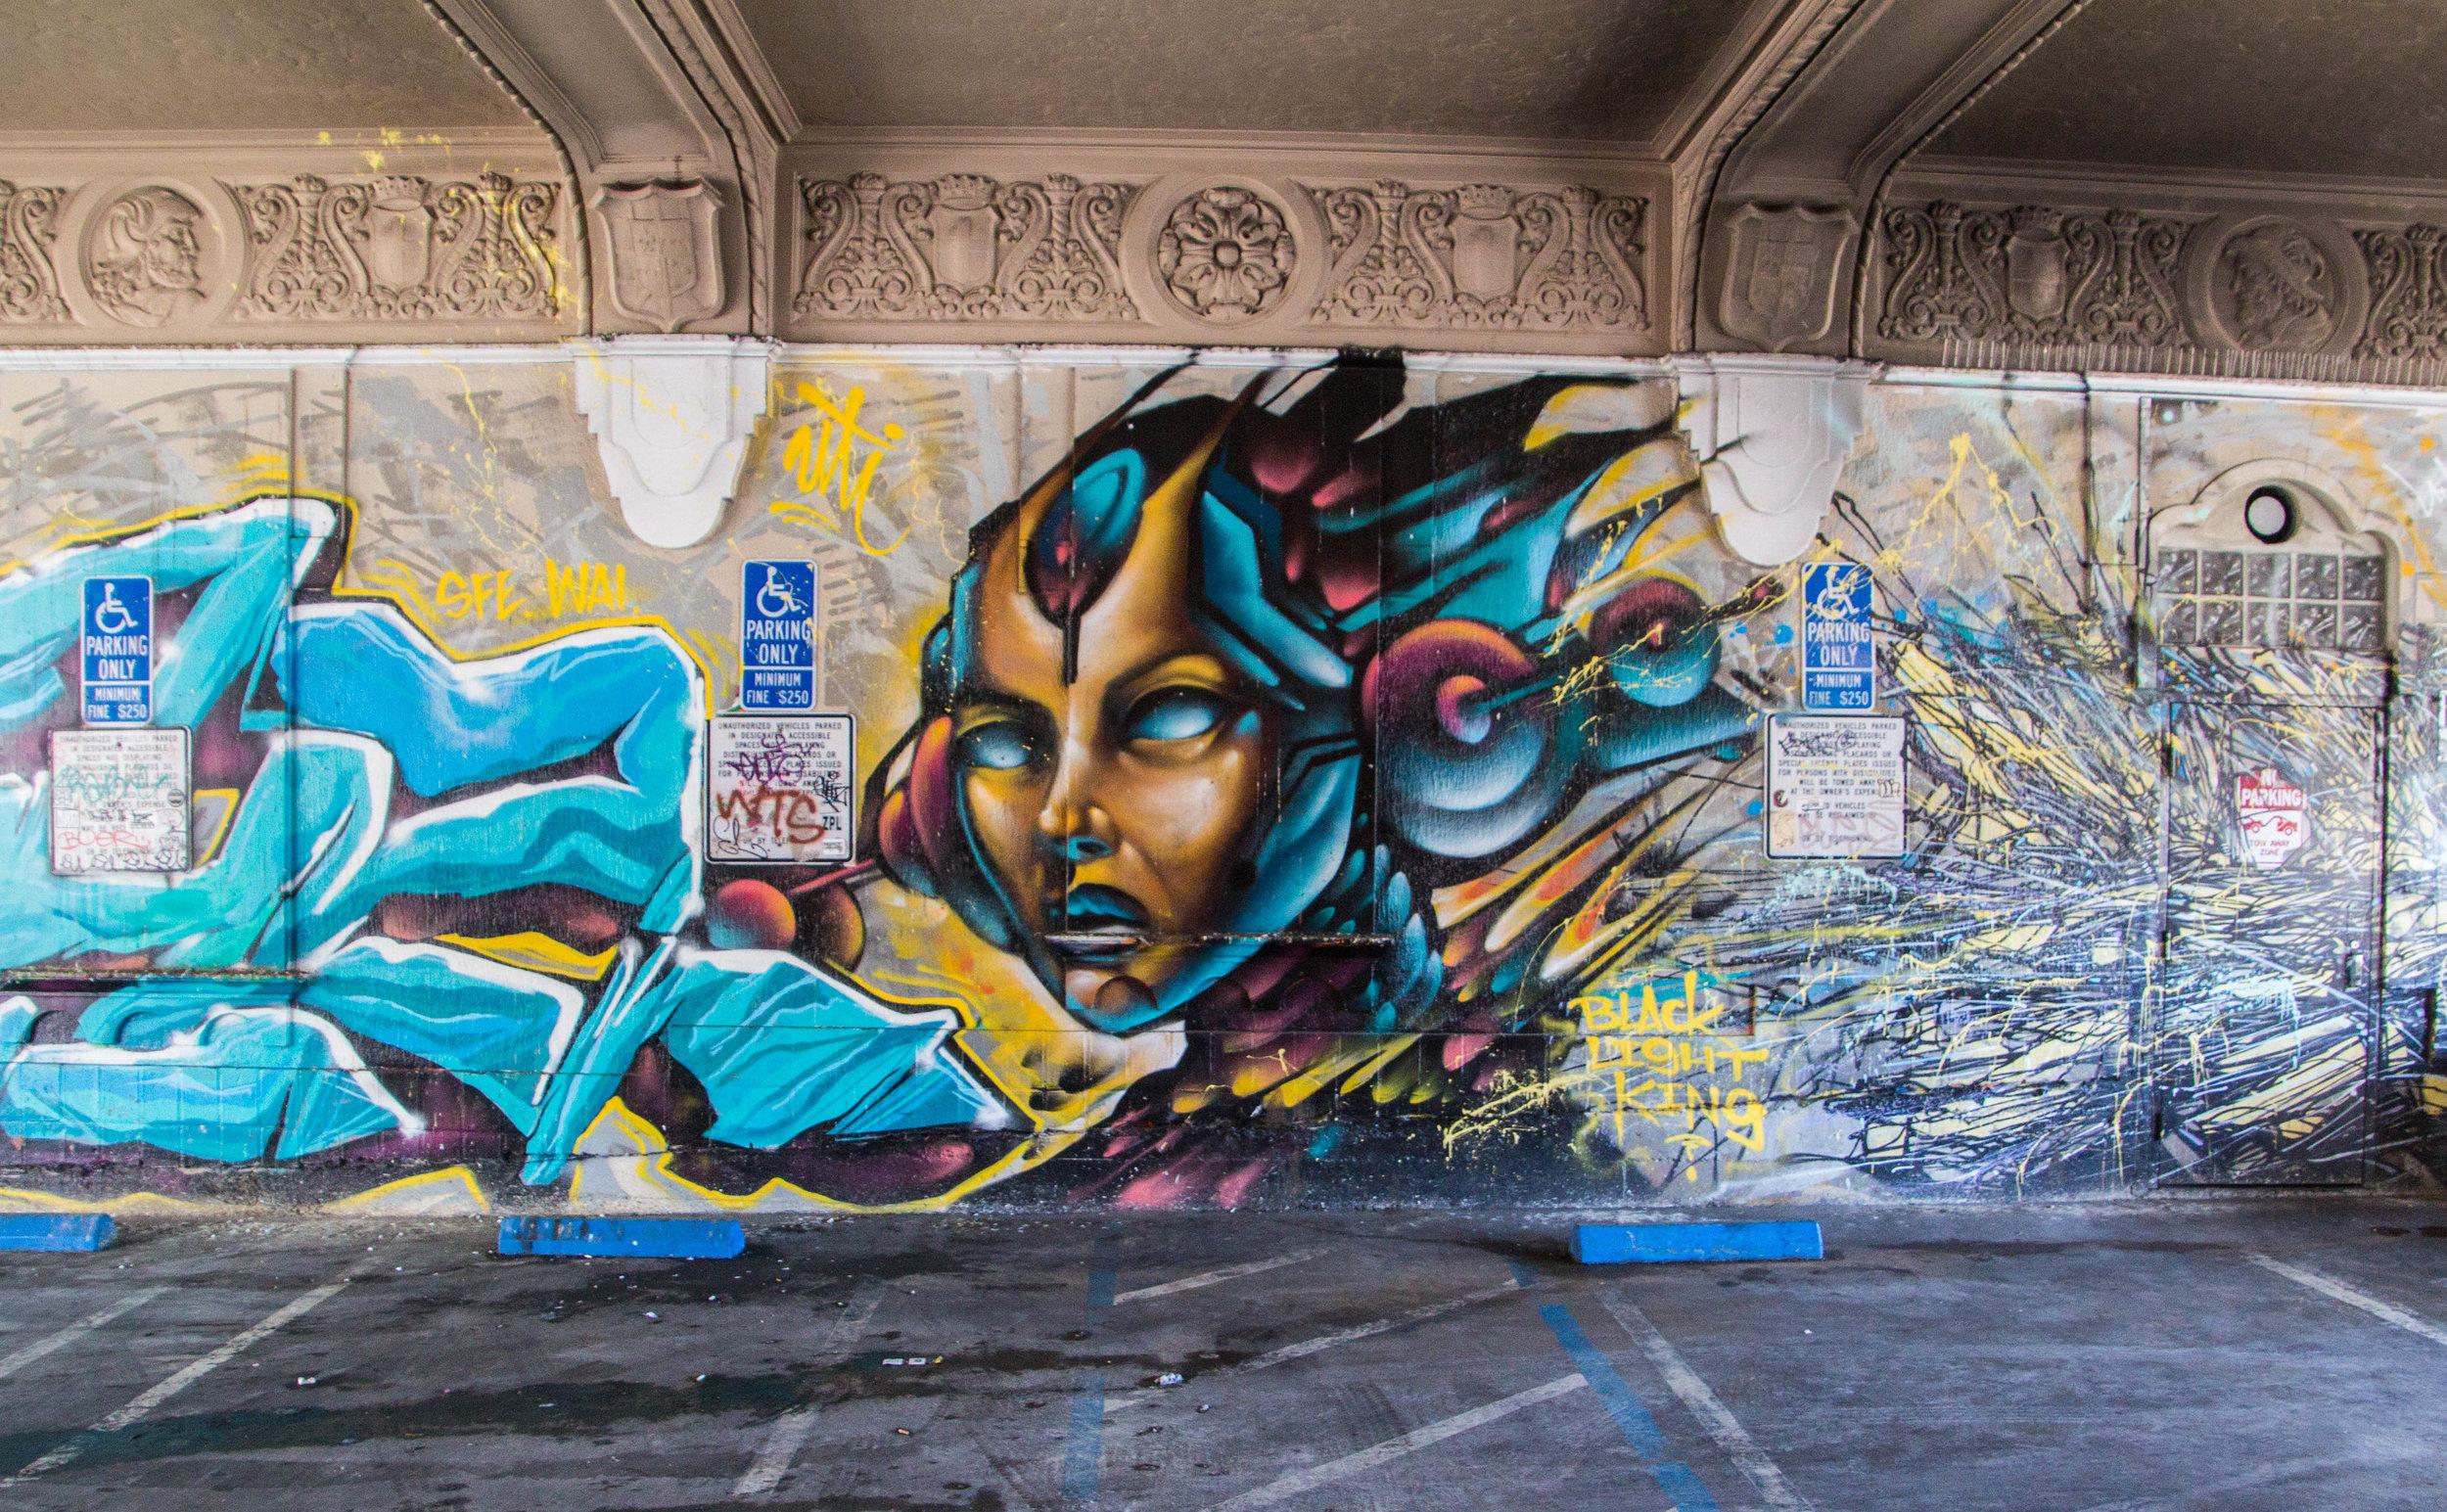 san-francisco-mission-district-street-art-52.jpg